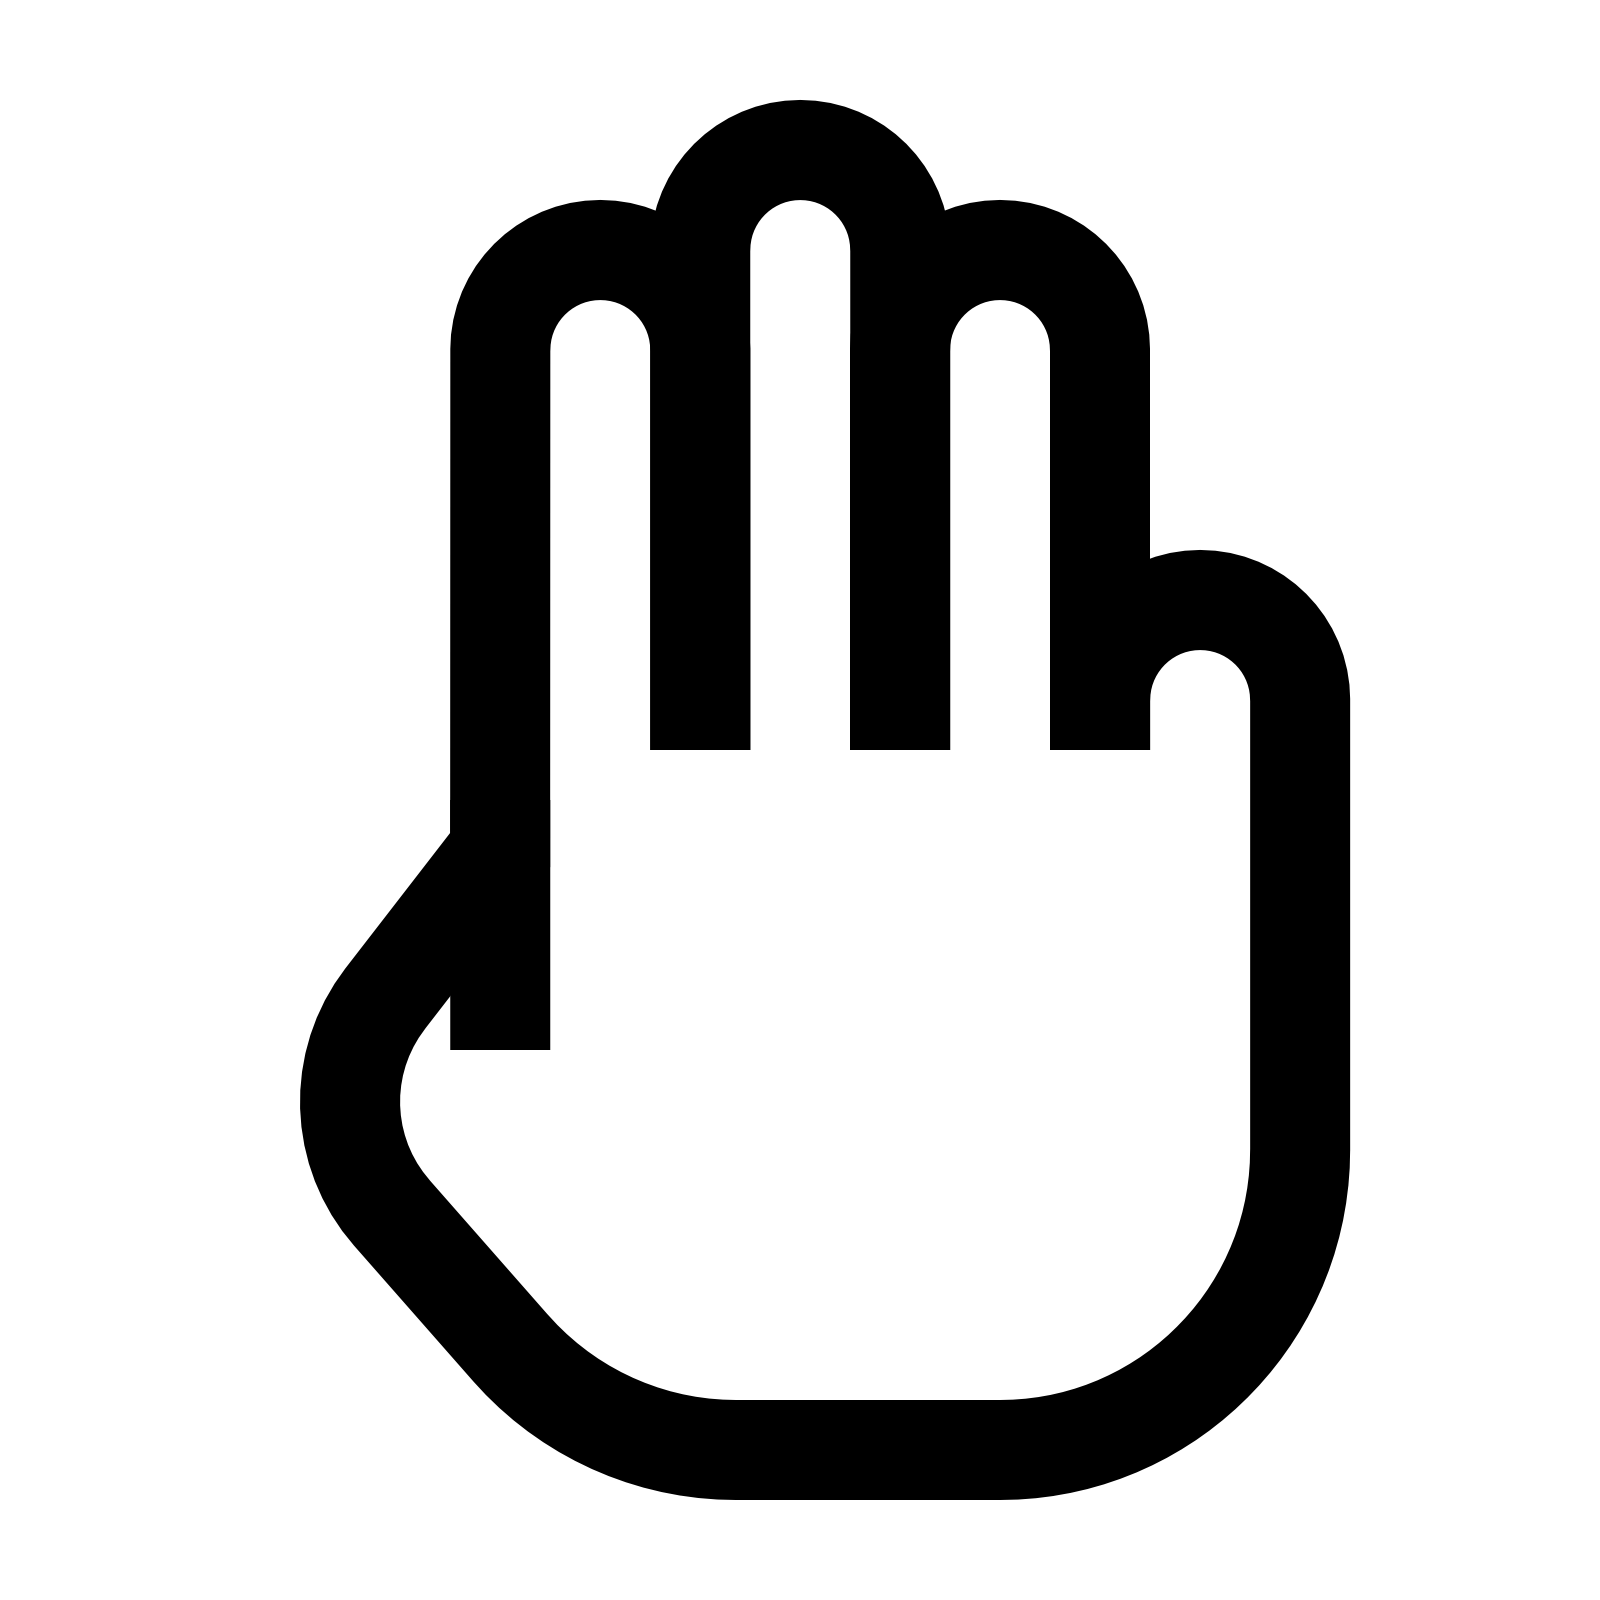 Fingers clipart finger space, Fingers finger space.